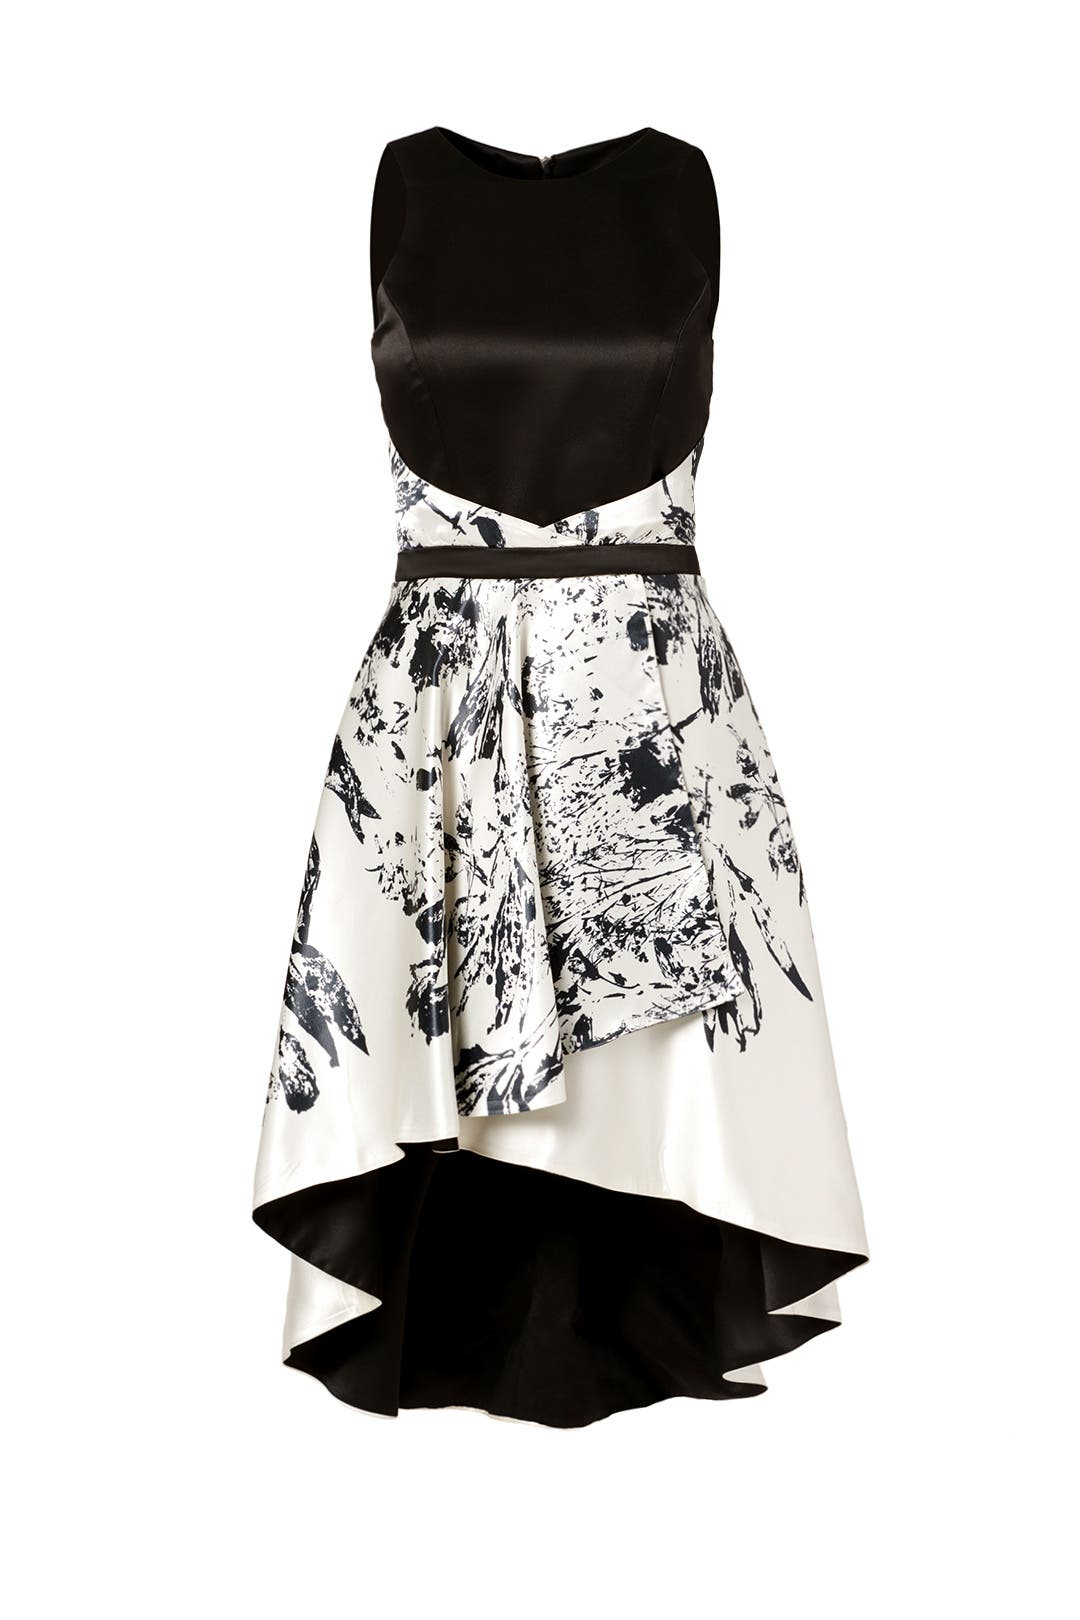 9 12 month black dress $30